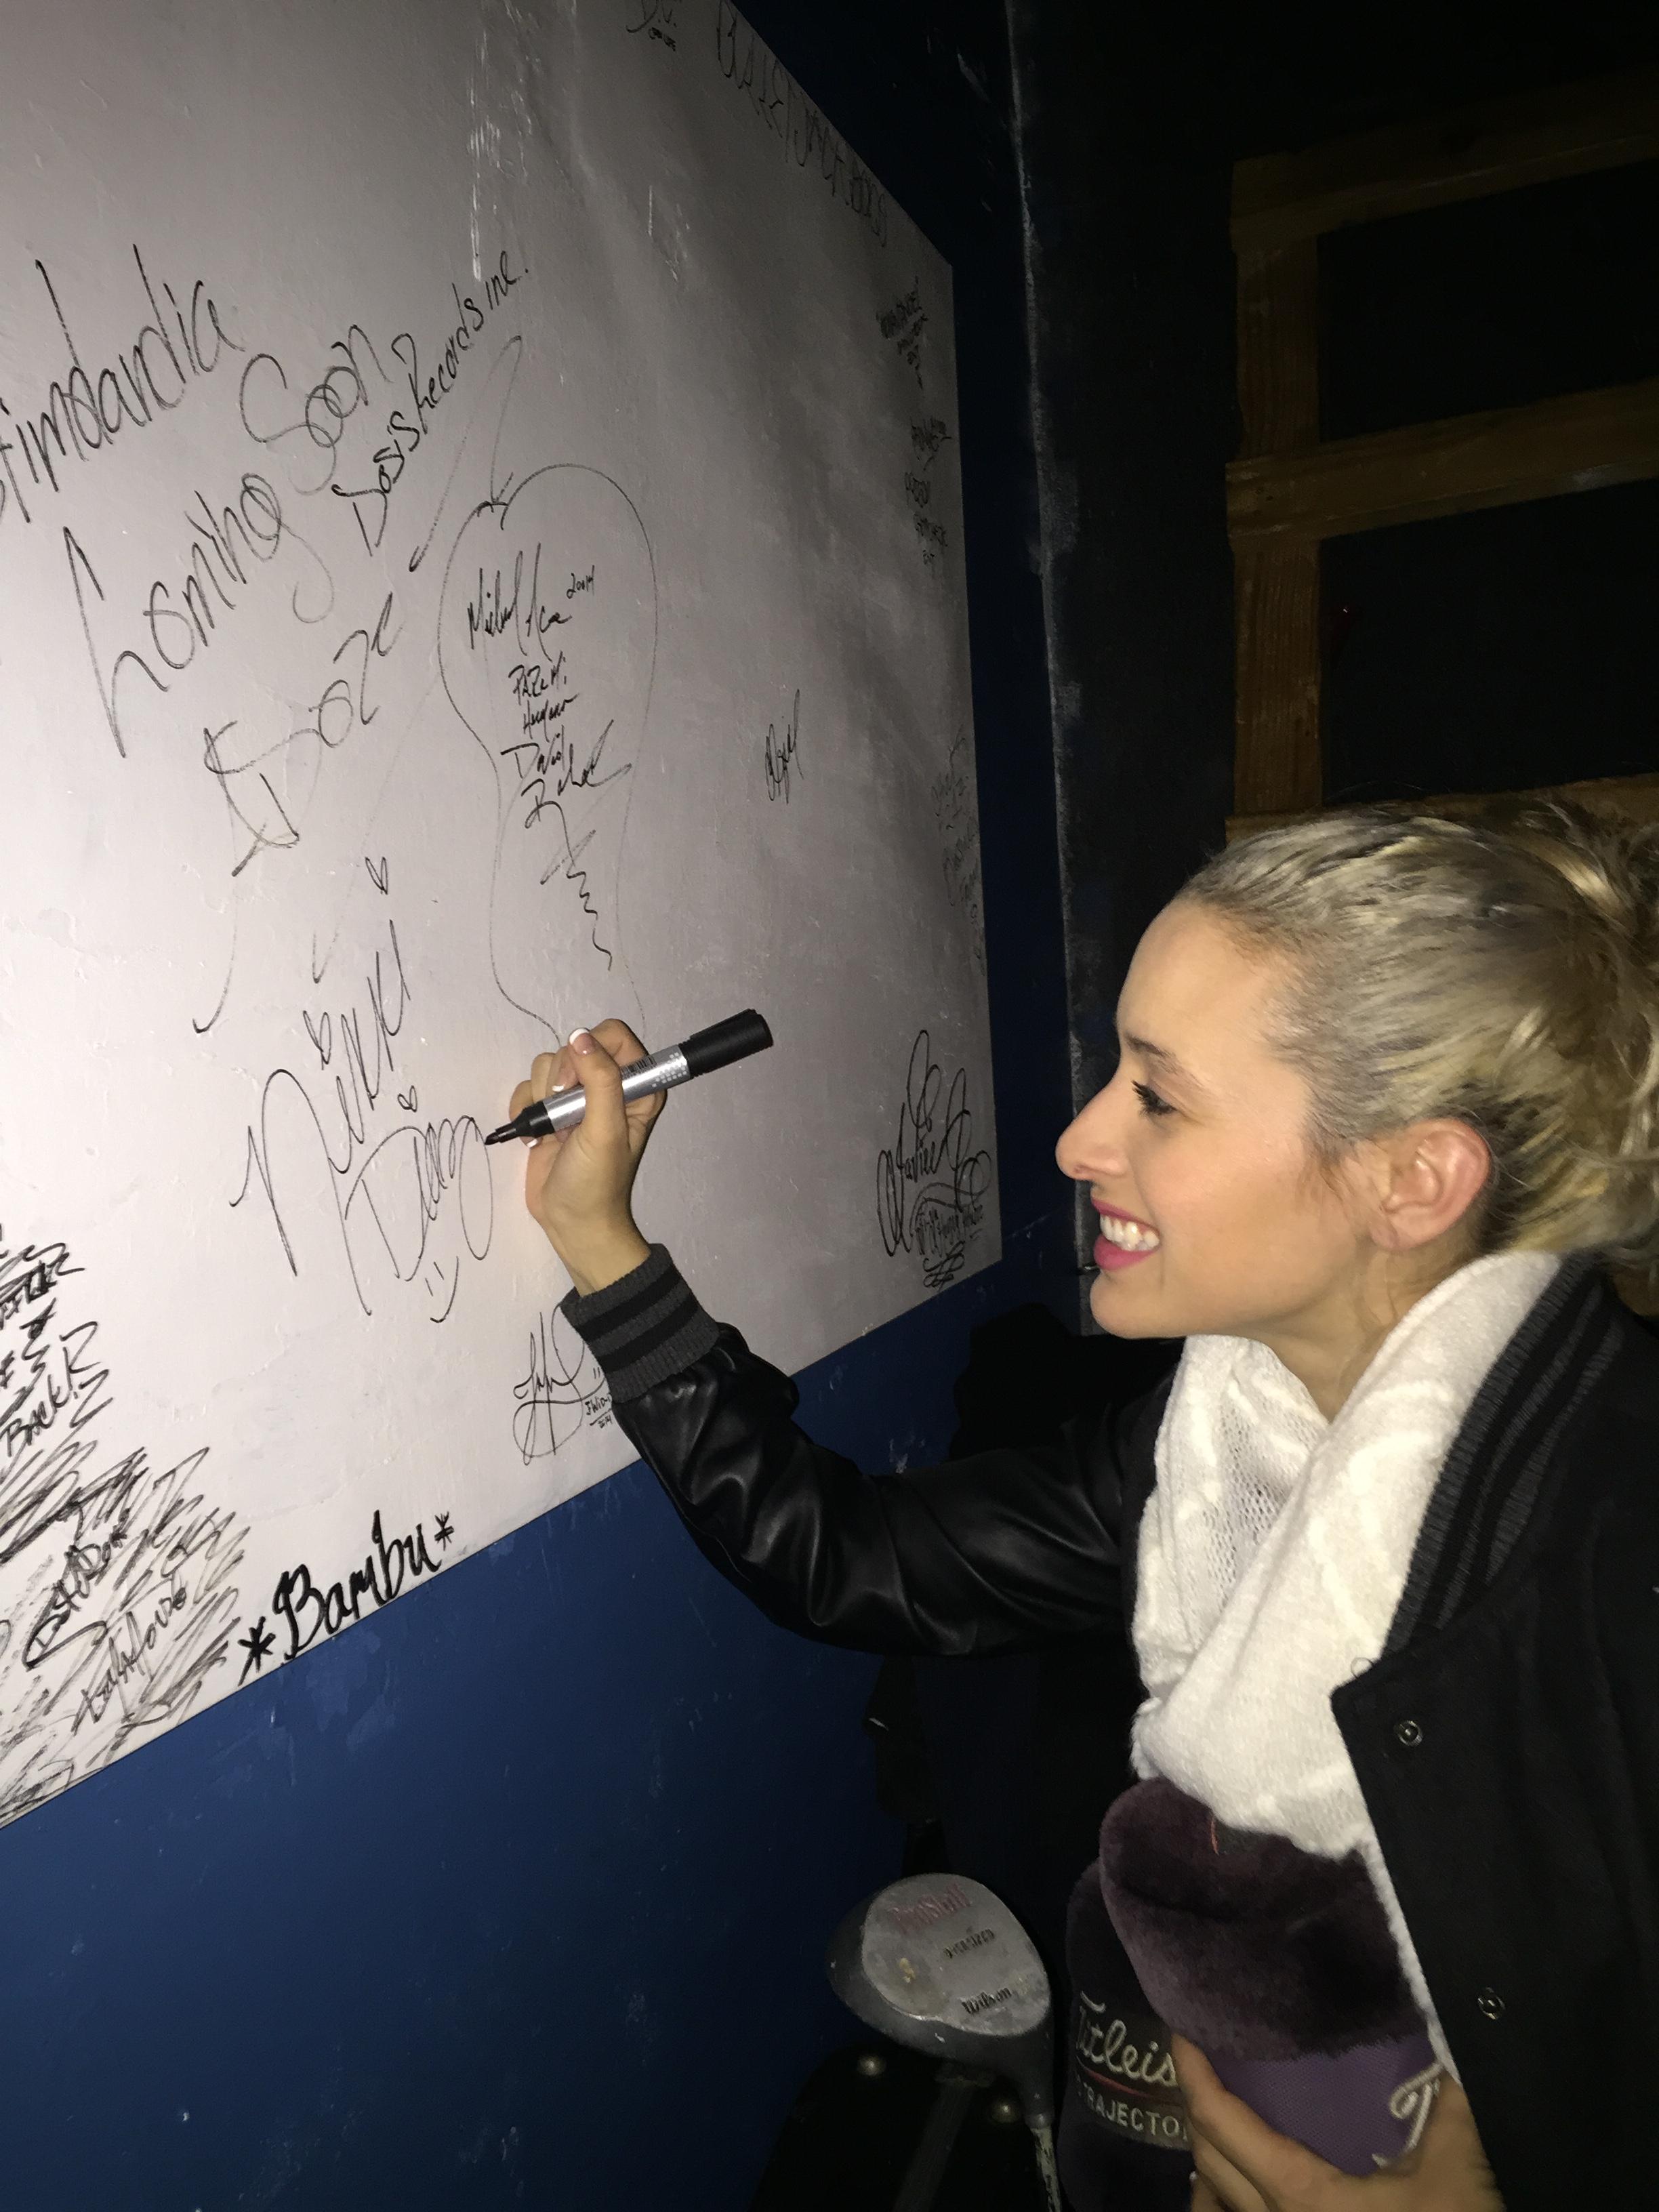 Signing the wall at David Rolas' studio in Los Angeles, CA